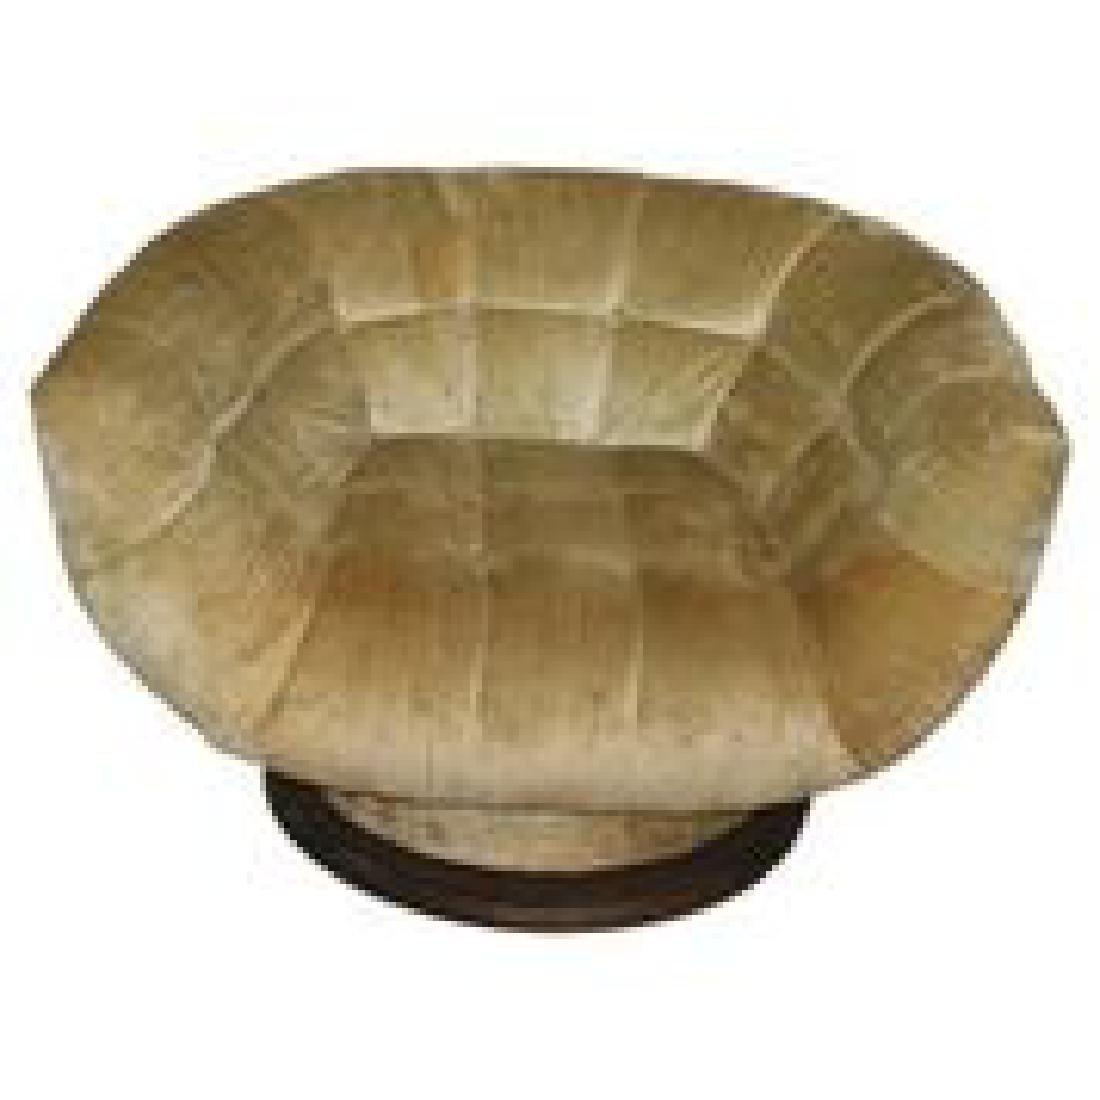 In The Manner of Vladimir Kagan Swivel Chair